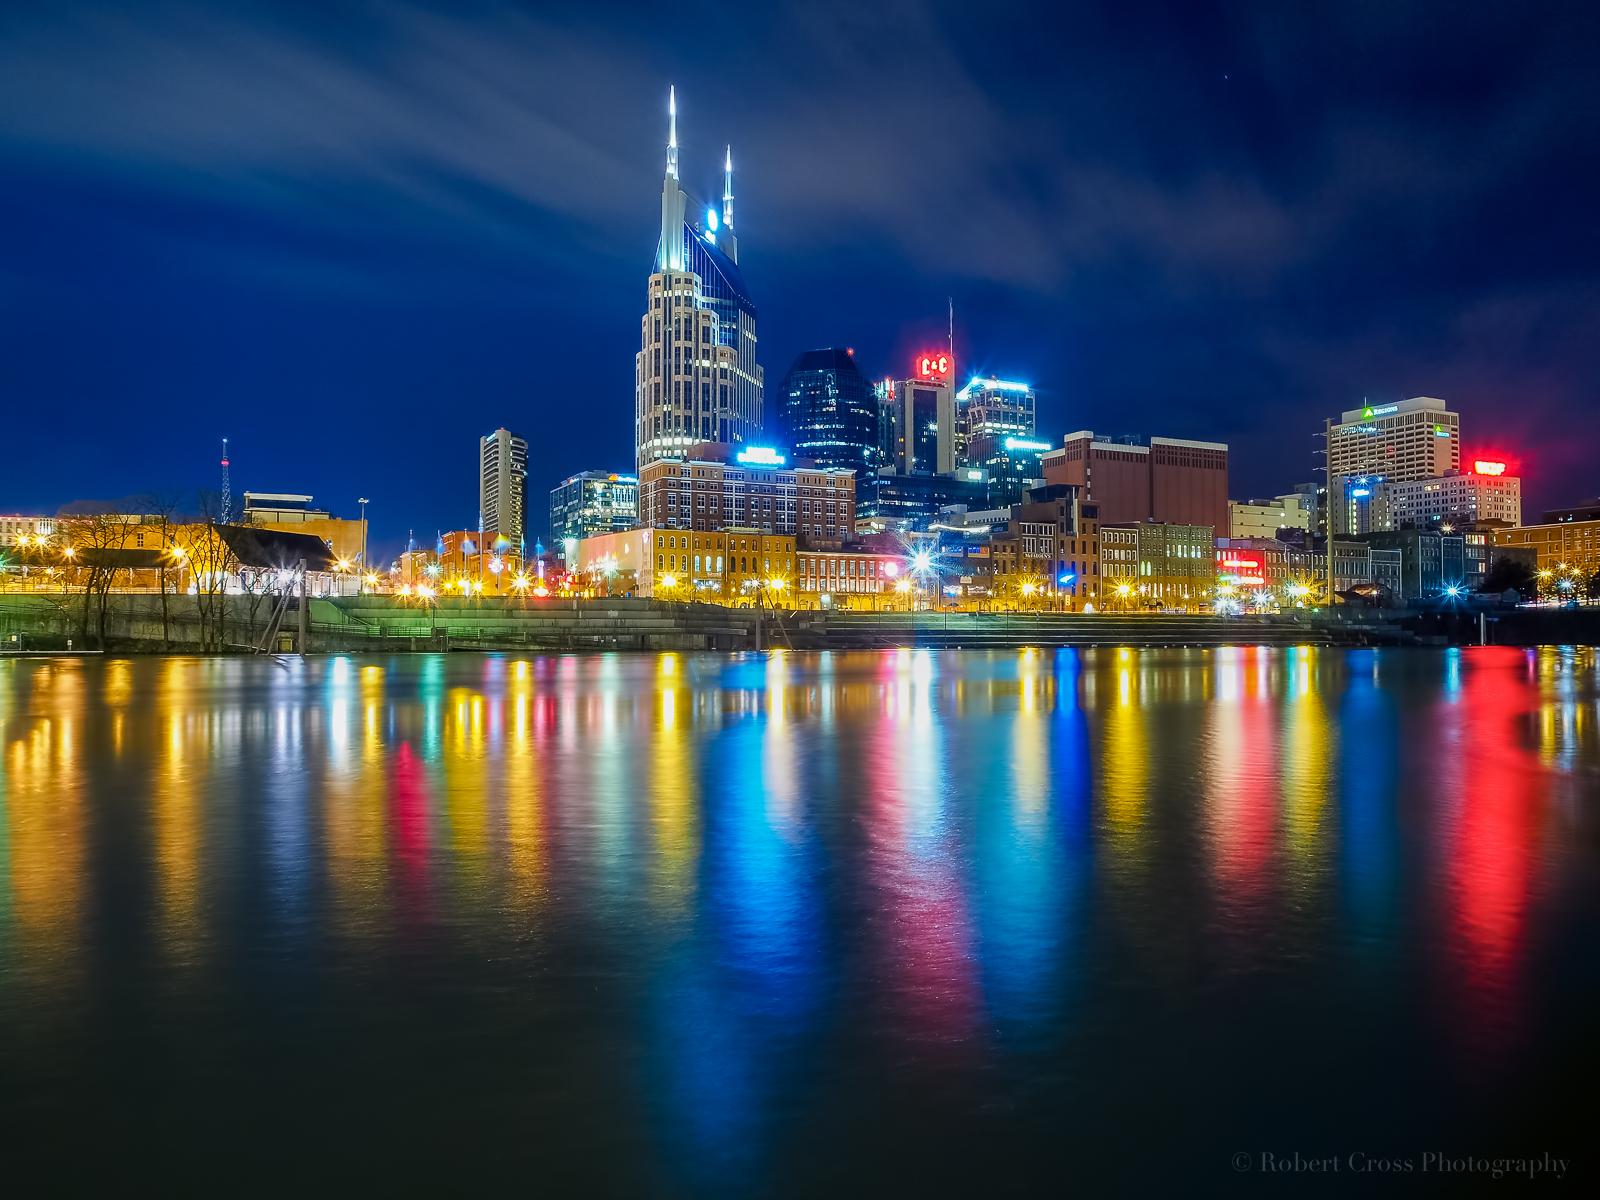 Wallpaper City Cityscape Night Water Reflection Sky